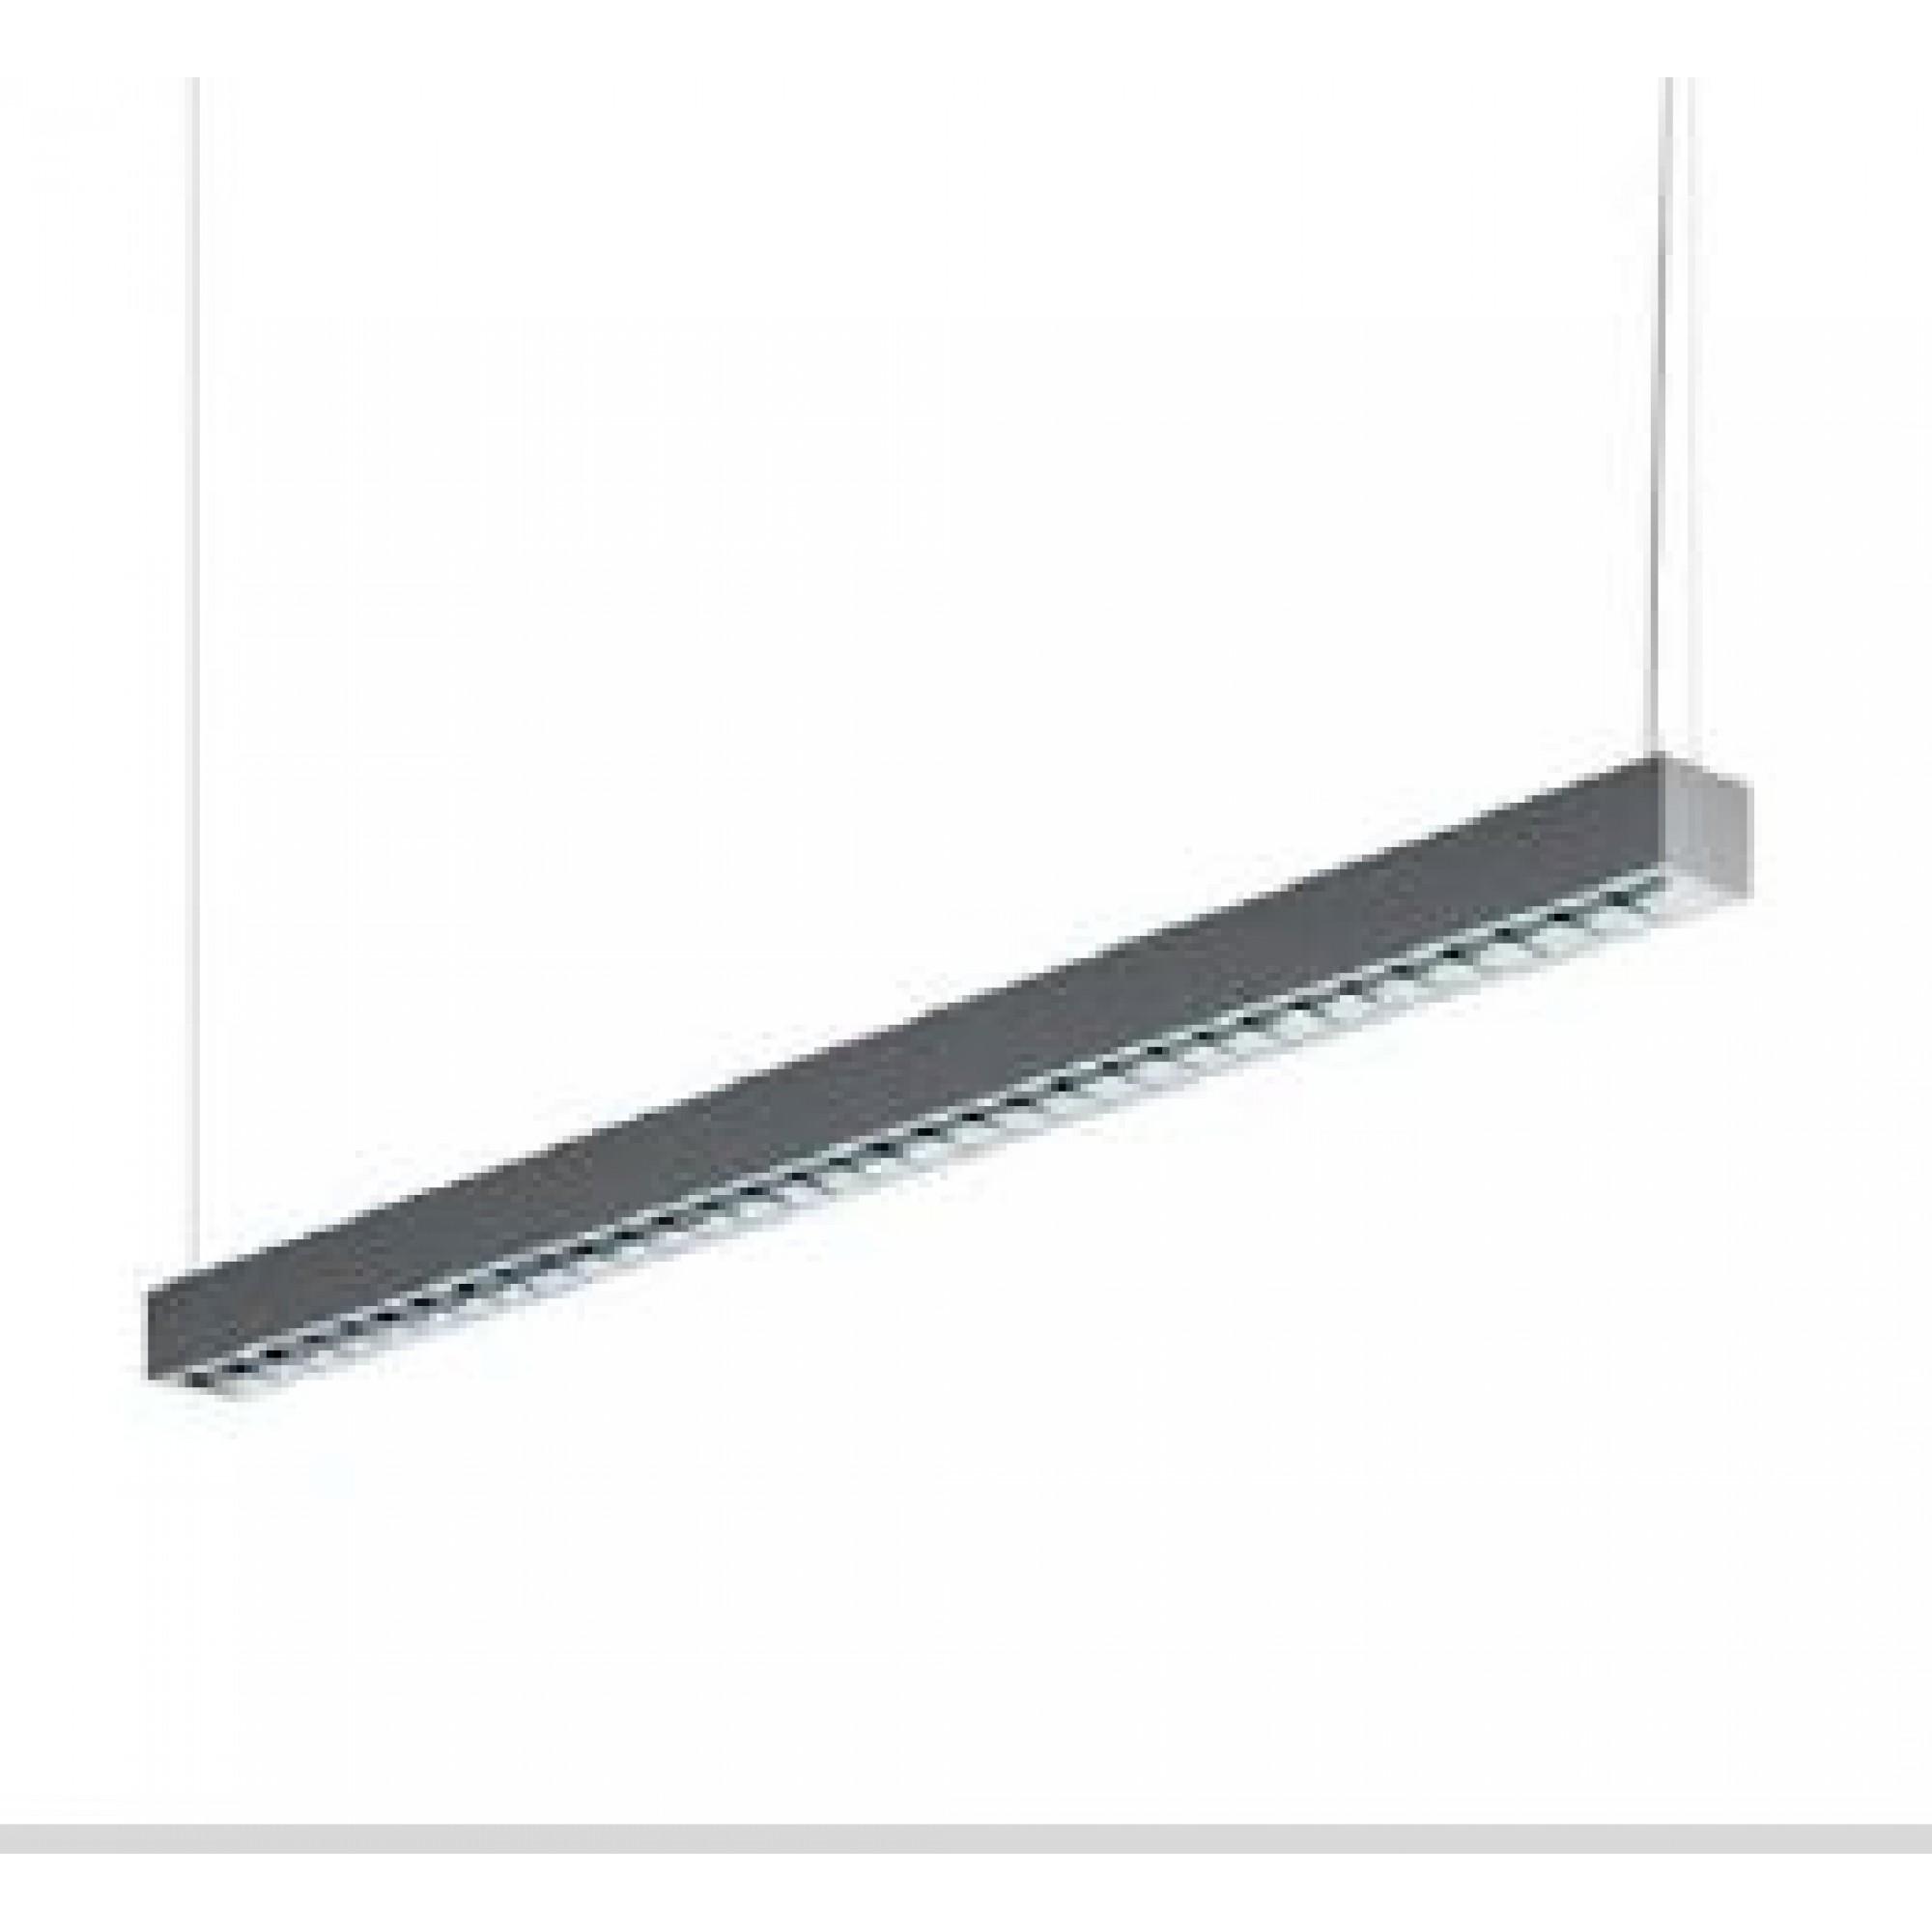 KALIFA II SUSP. DIRECT DARK LIGHT 1200 T16 1X28W - Modern -  ARTEMIDE